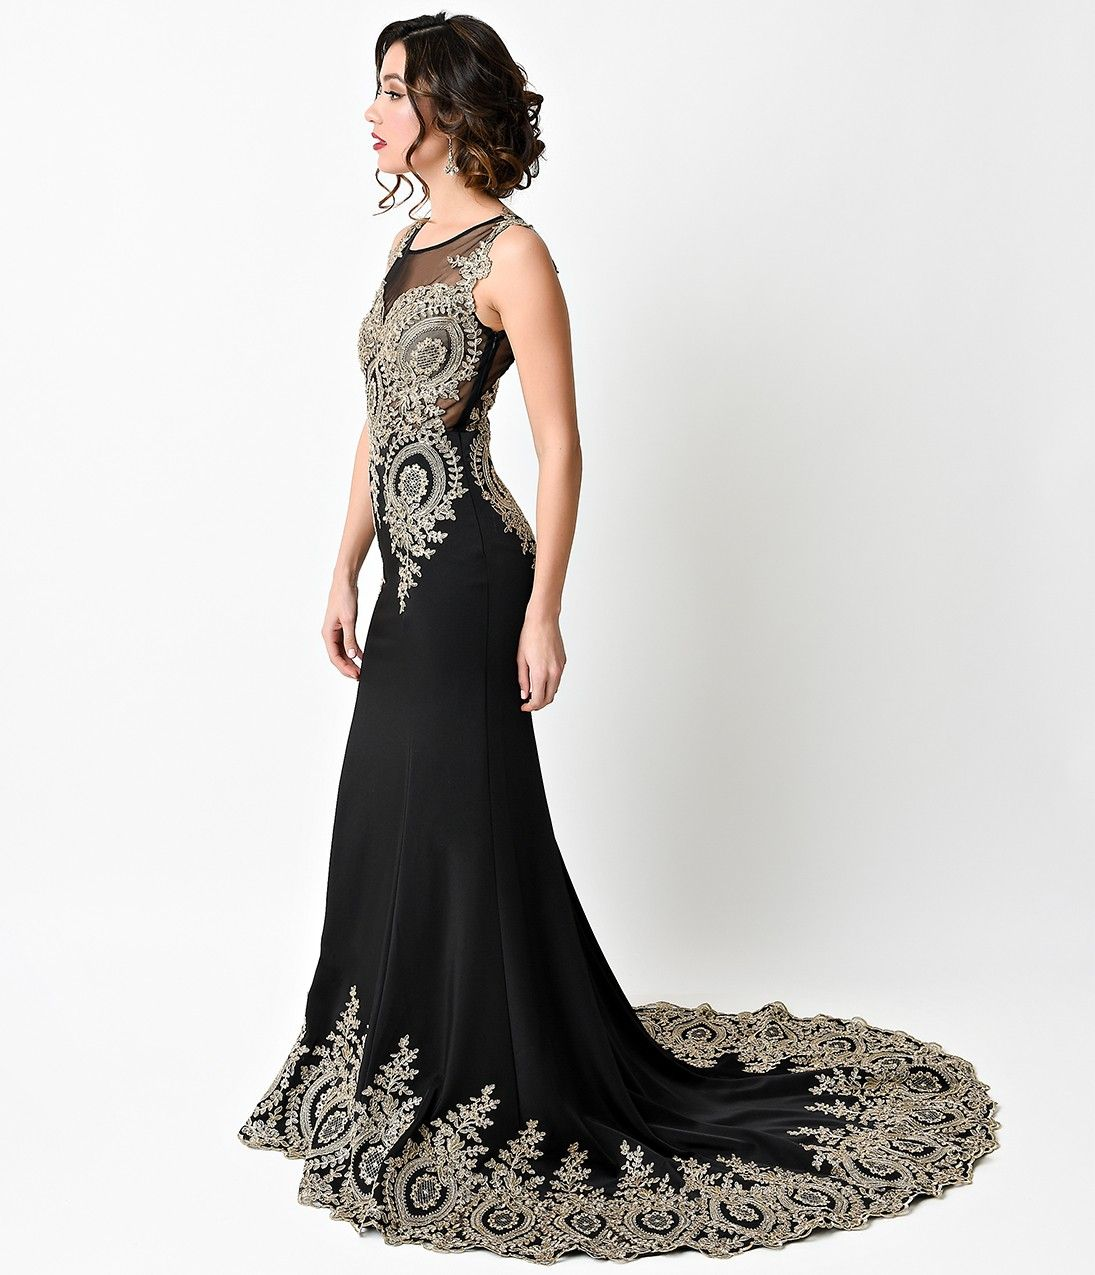 S style black u gold filigree bias cut satin gown clothes